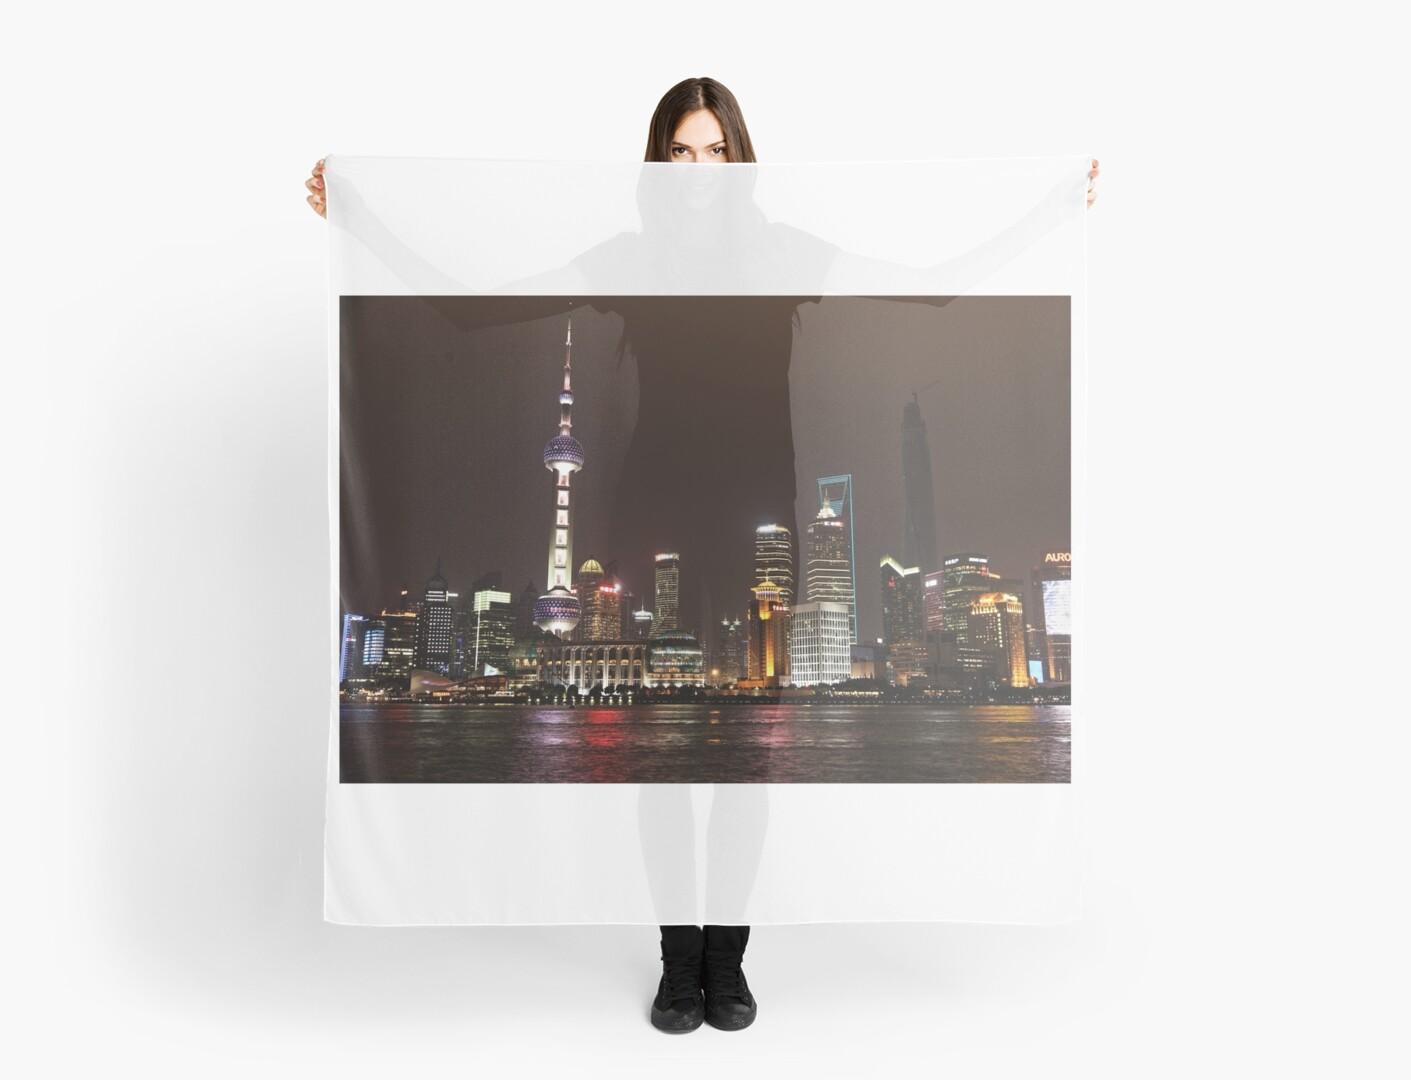 Shanghai Skyline at Night by Holger Mader